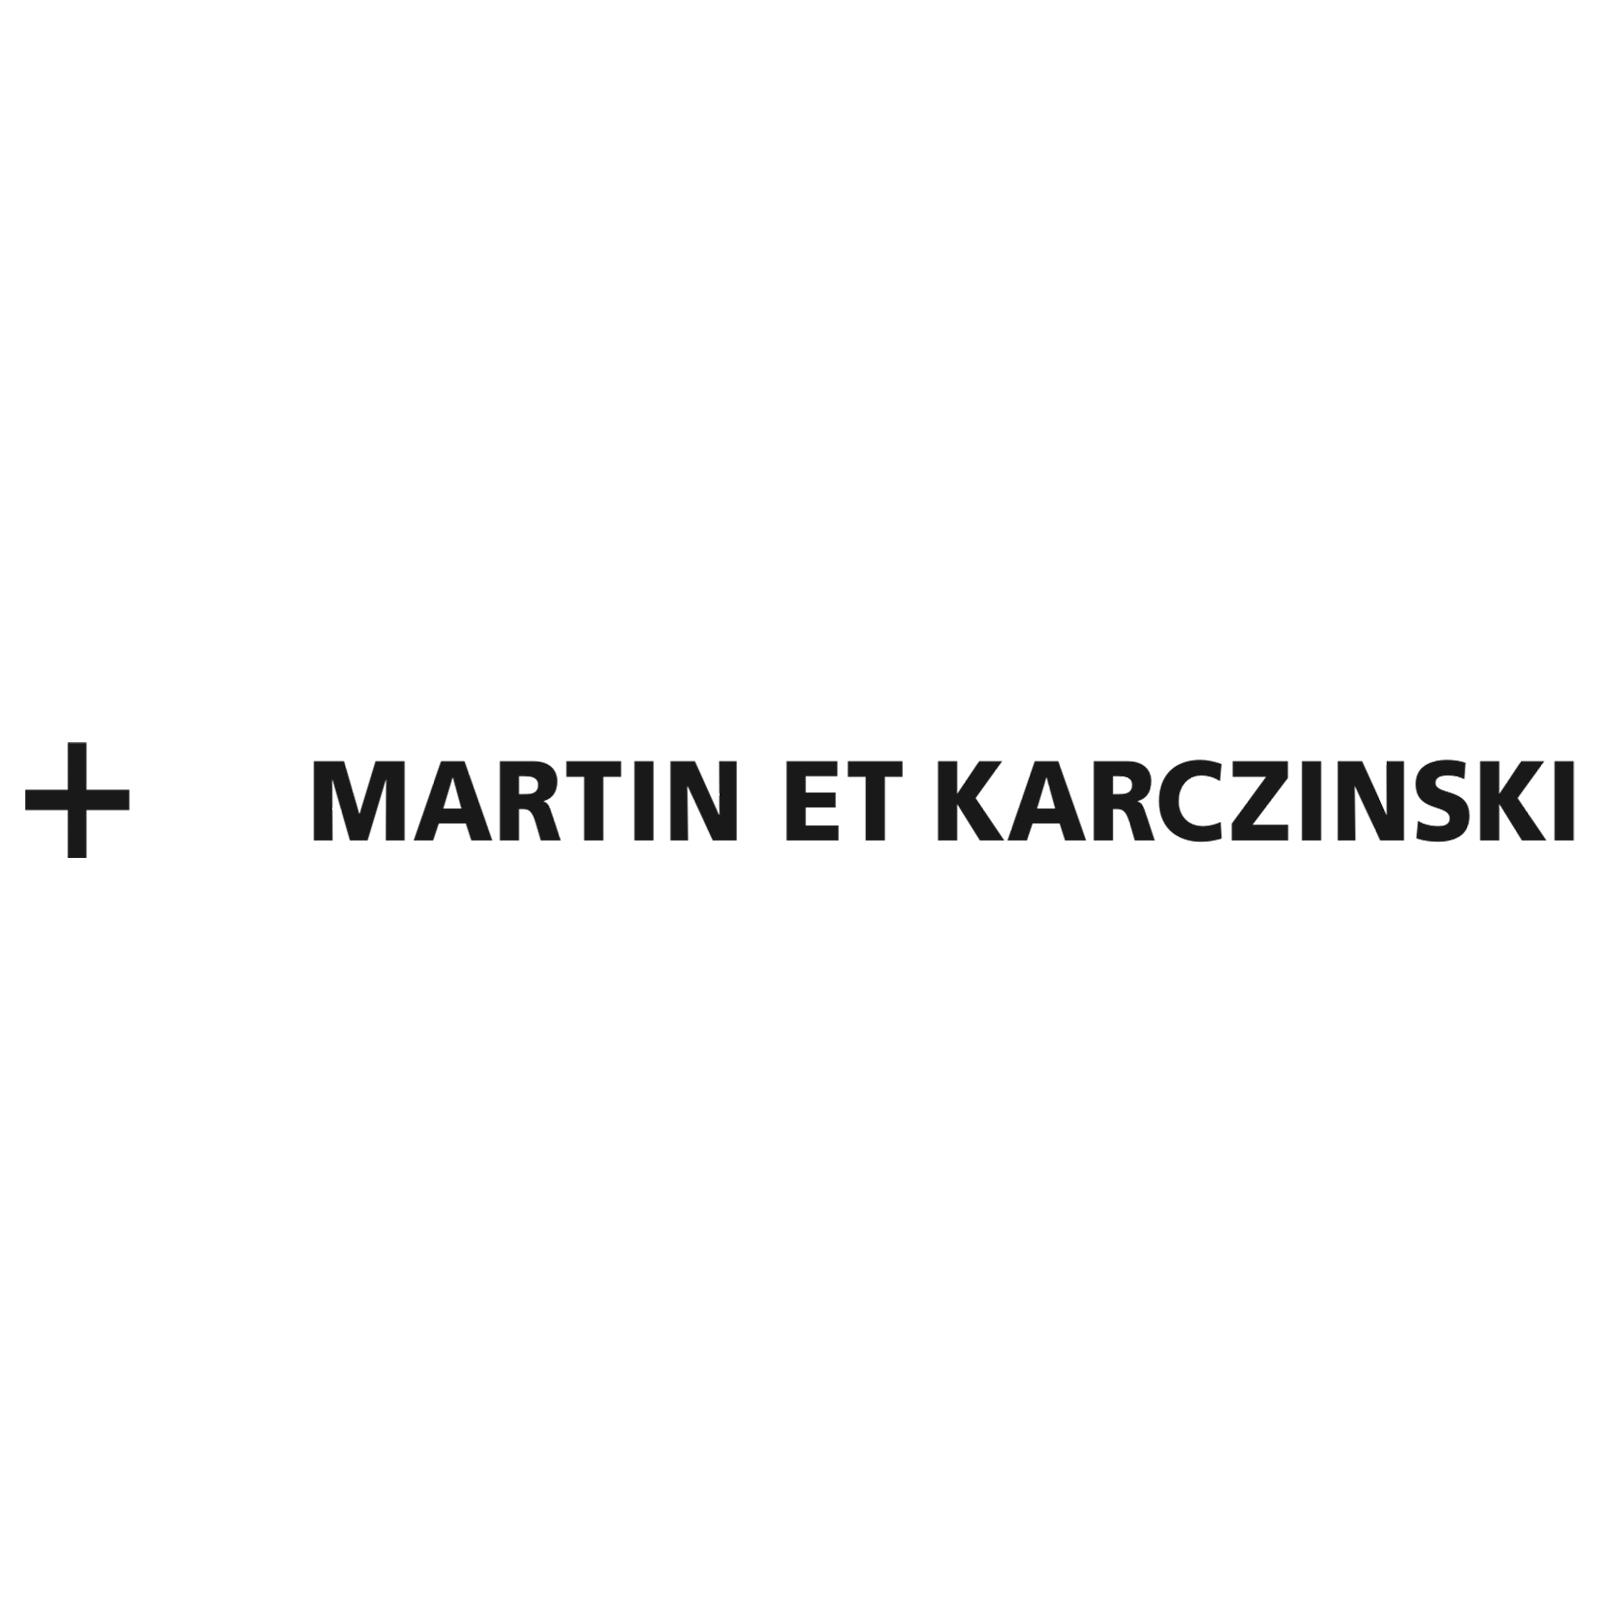 Martin et Karczinski